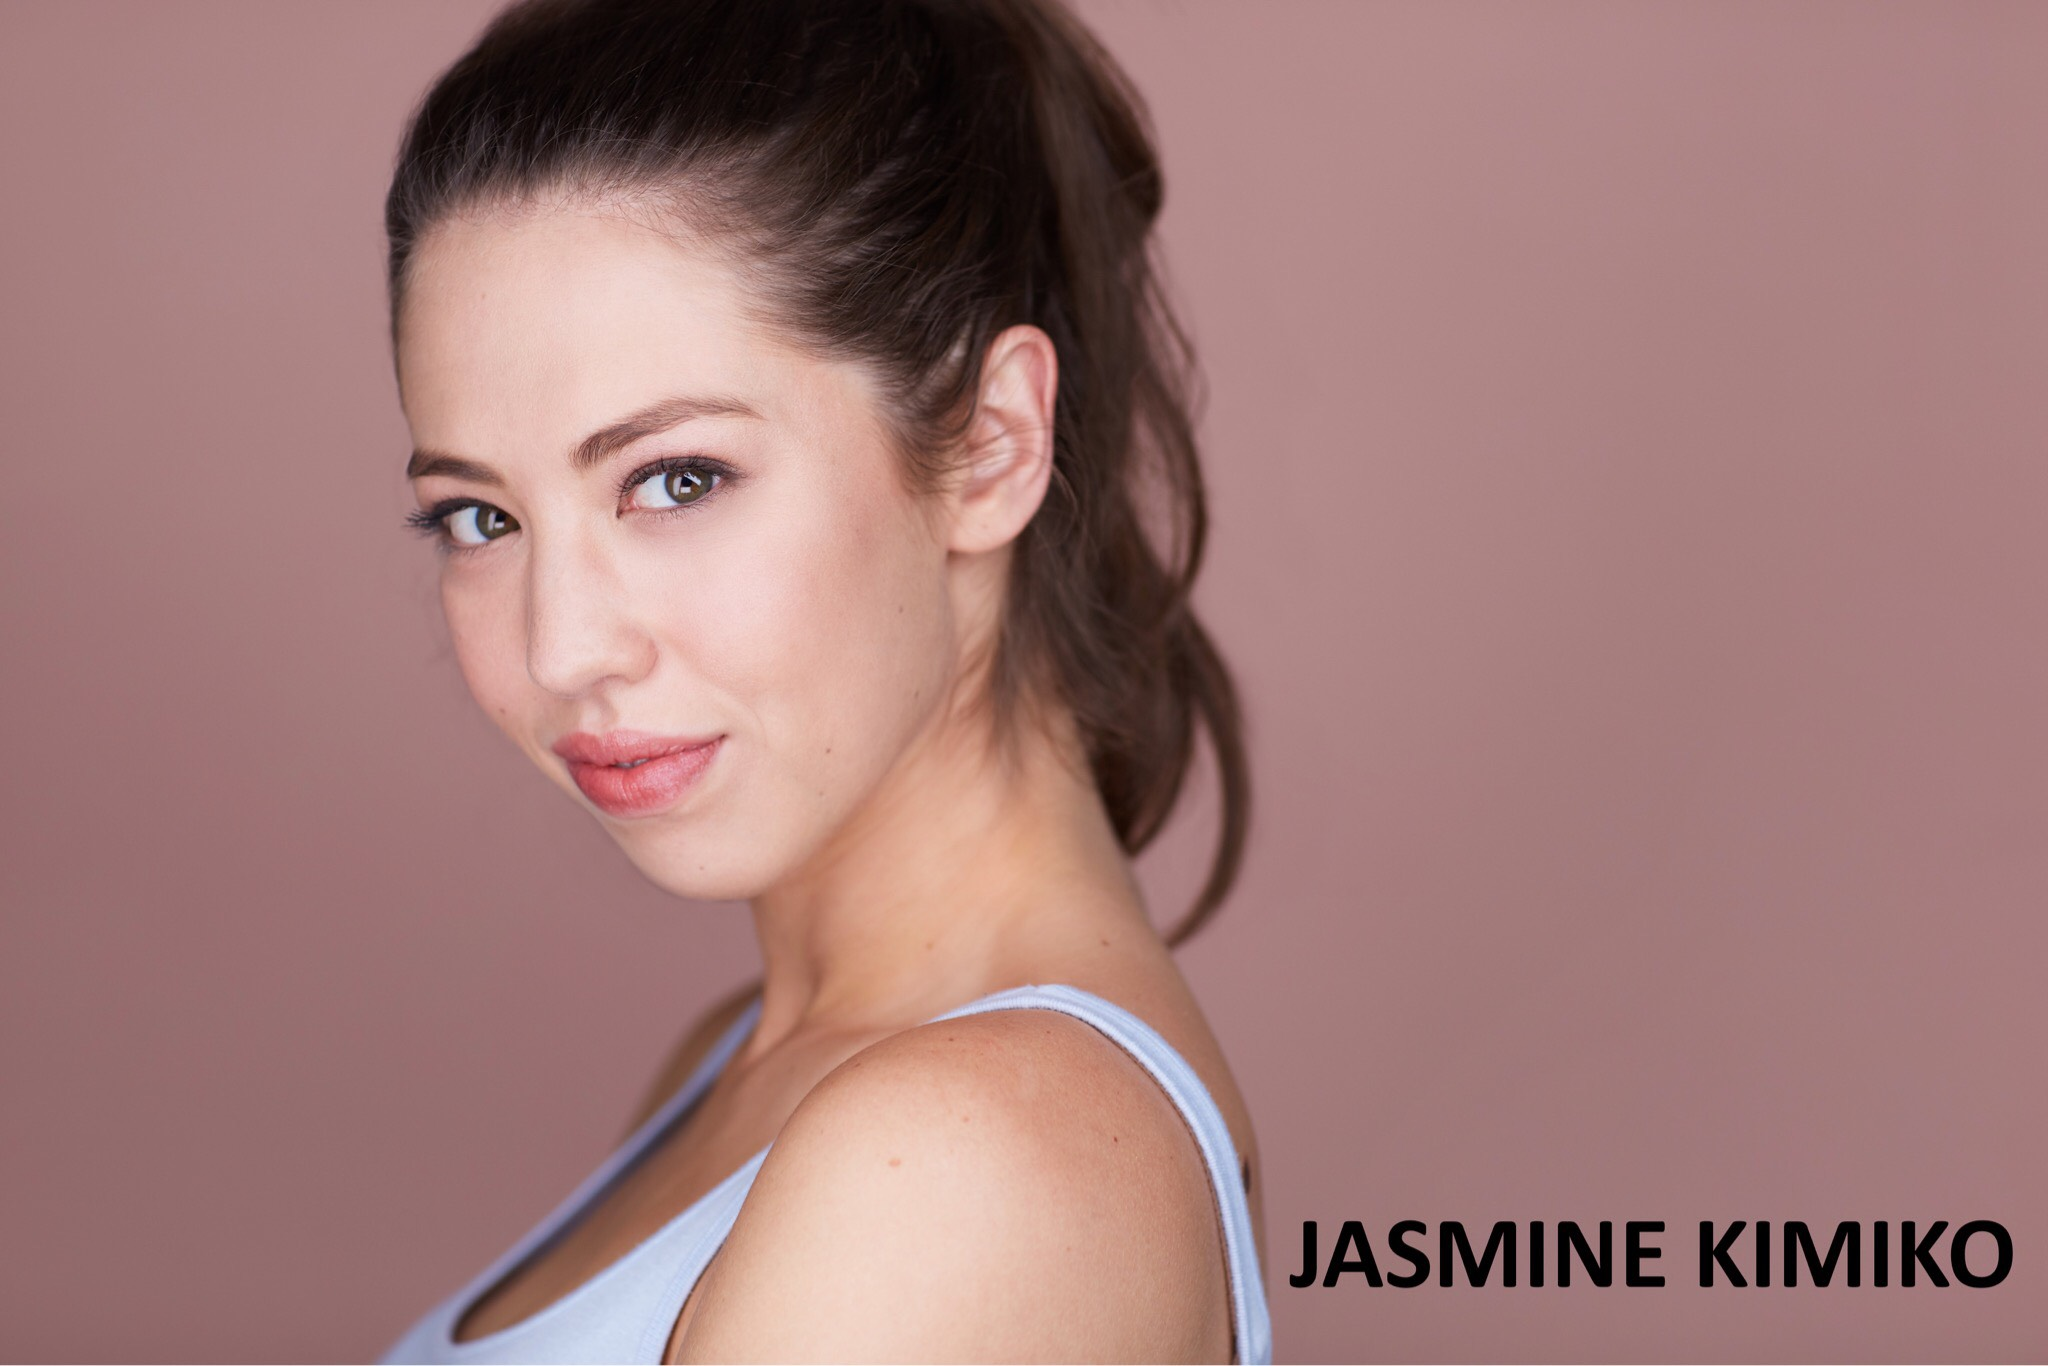 Jasmine Kimiko photo.jpg